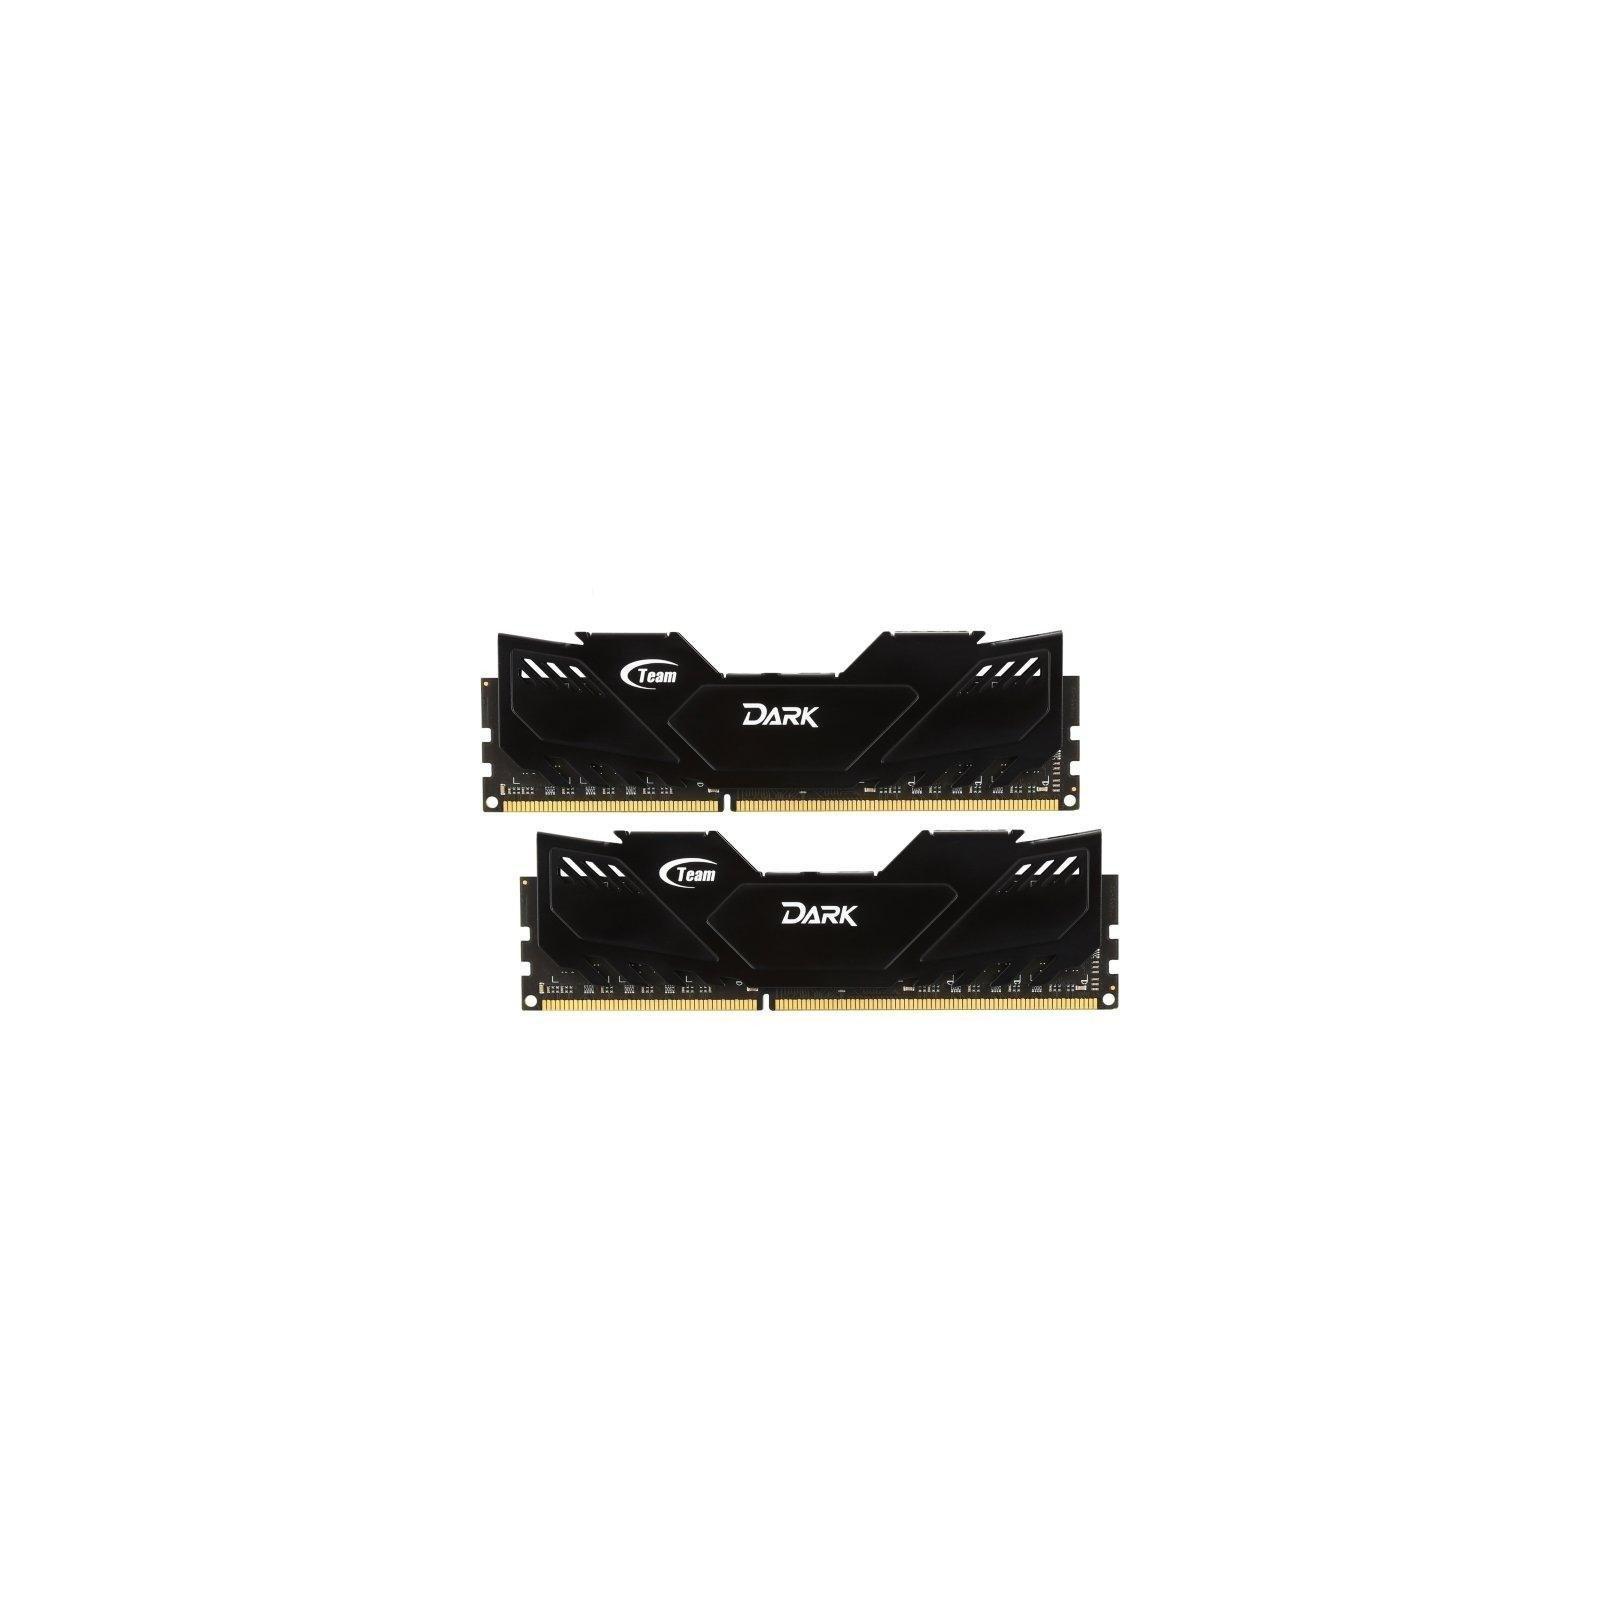 Модуль памяти для компьютера DDR4 8GB (2x4GB) 2666 MHz Dark Black Team (TDKED48G2666HC15ADC01)